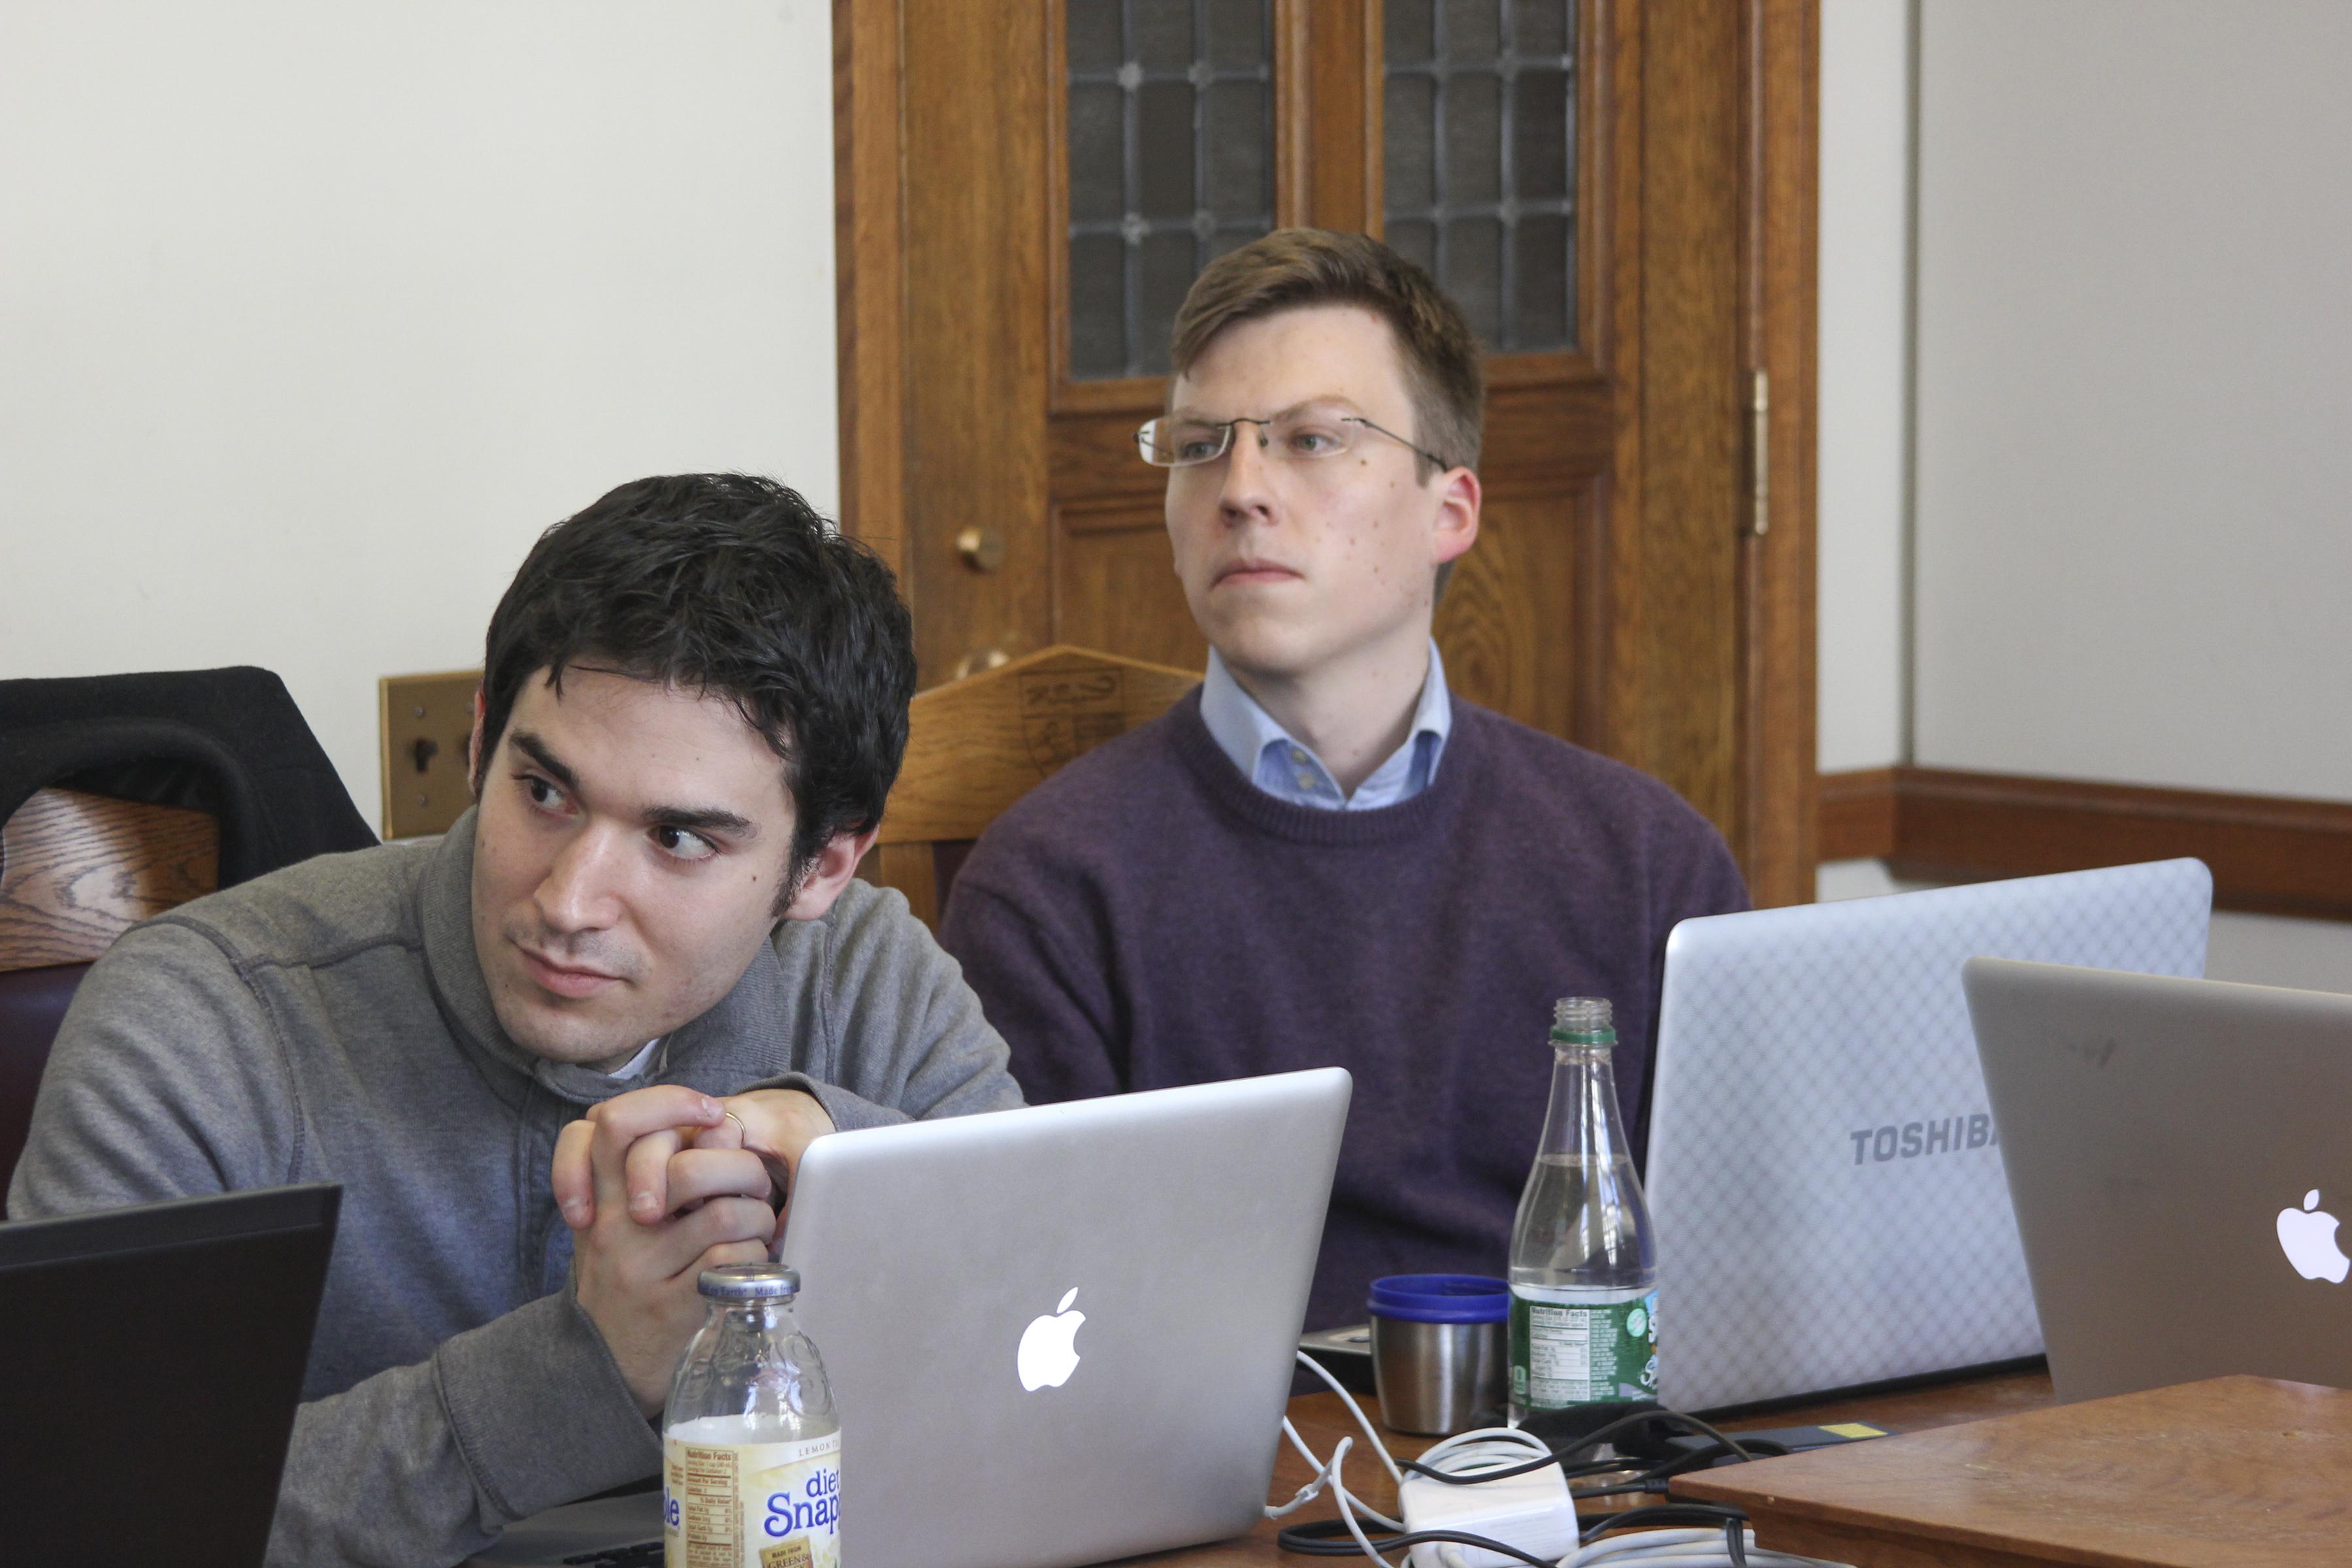 Joshua Mitts '13 and Martin Gross-Langenhoff LLM '12